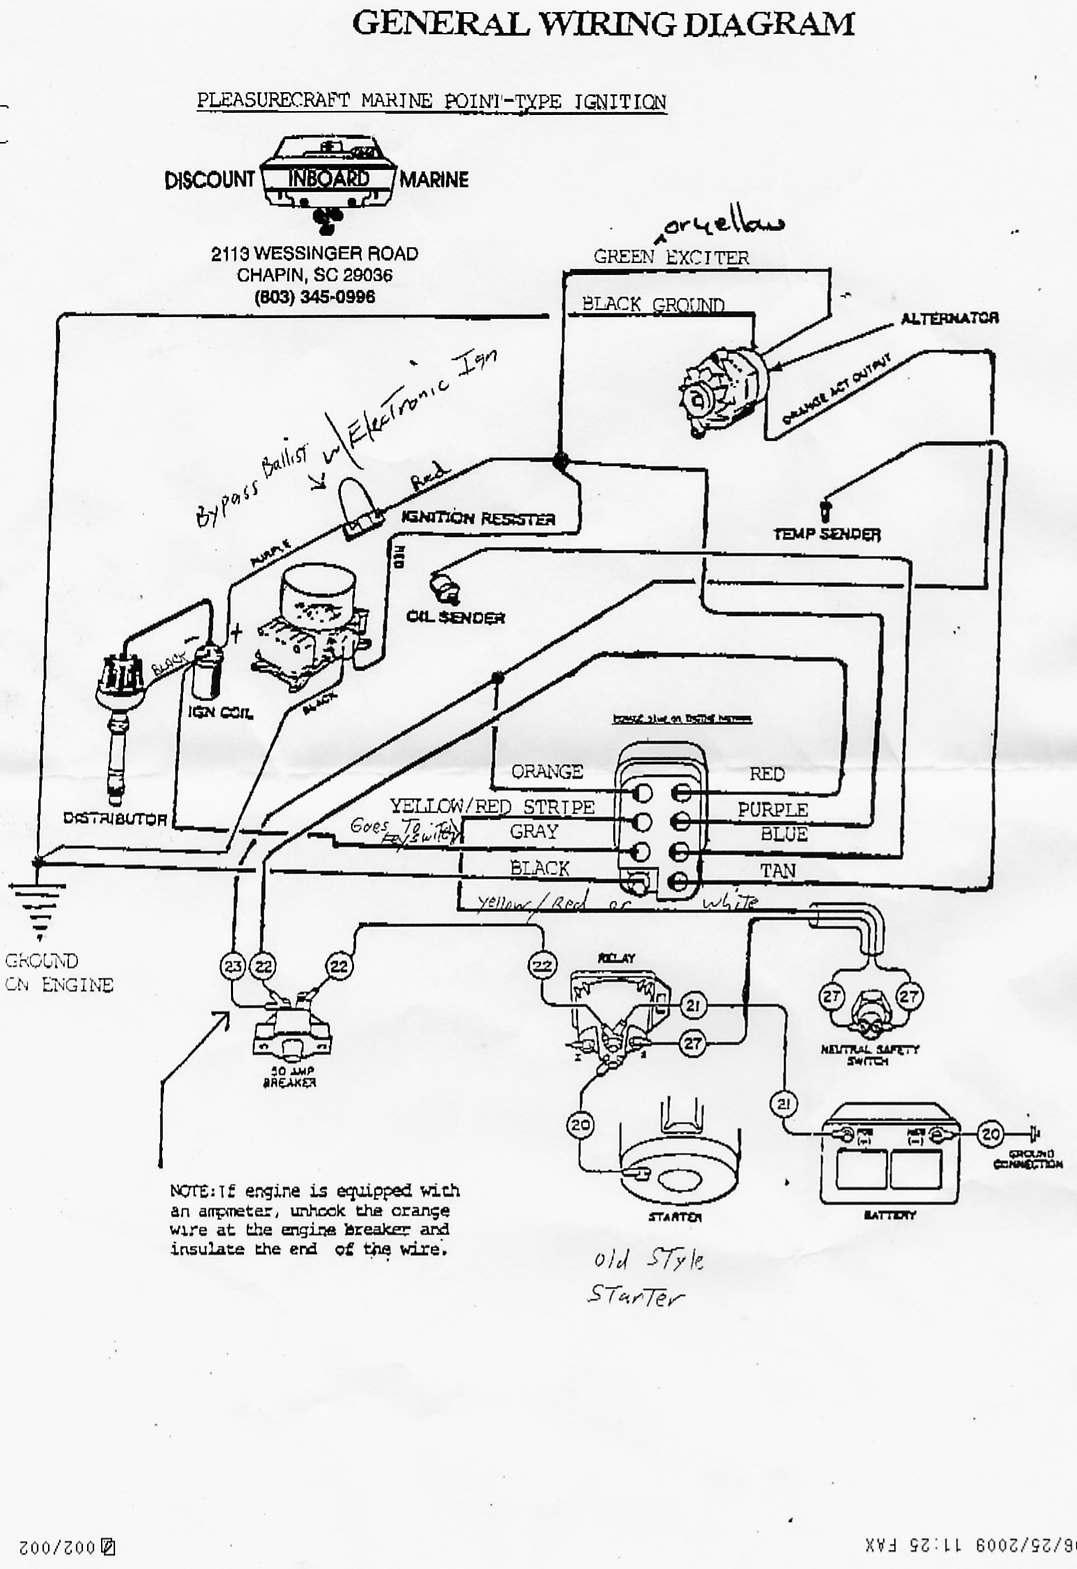 ignition switch - 82 ski nautique - correctcraftfan forums